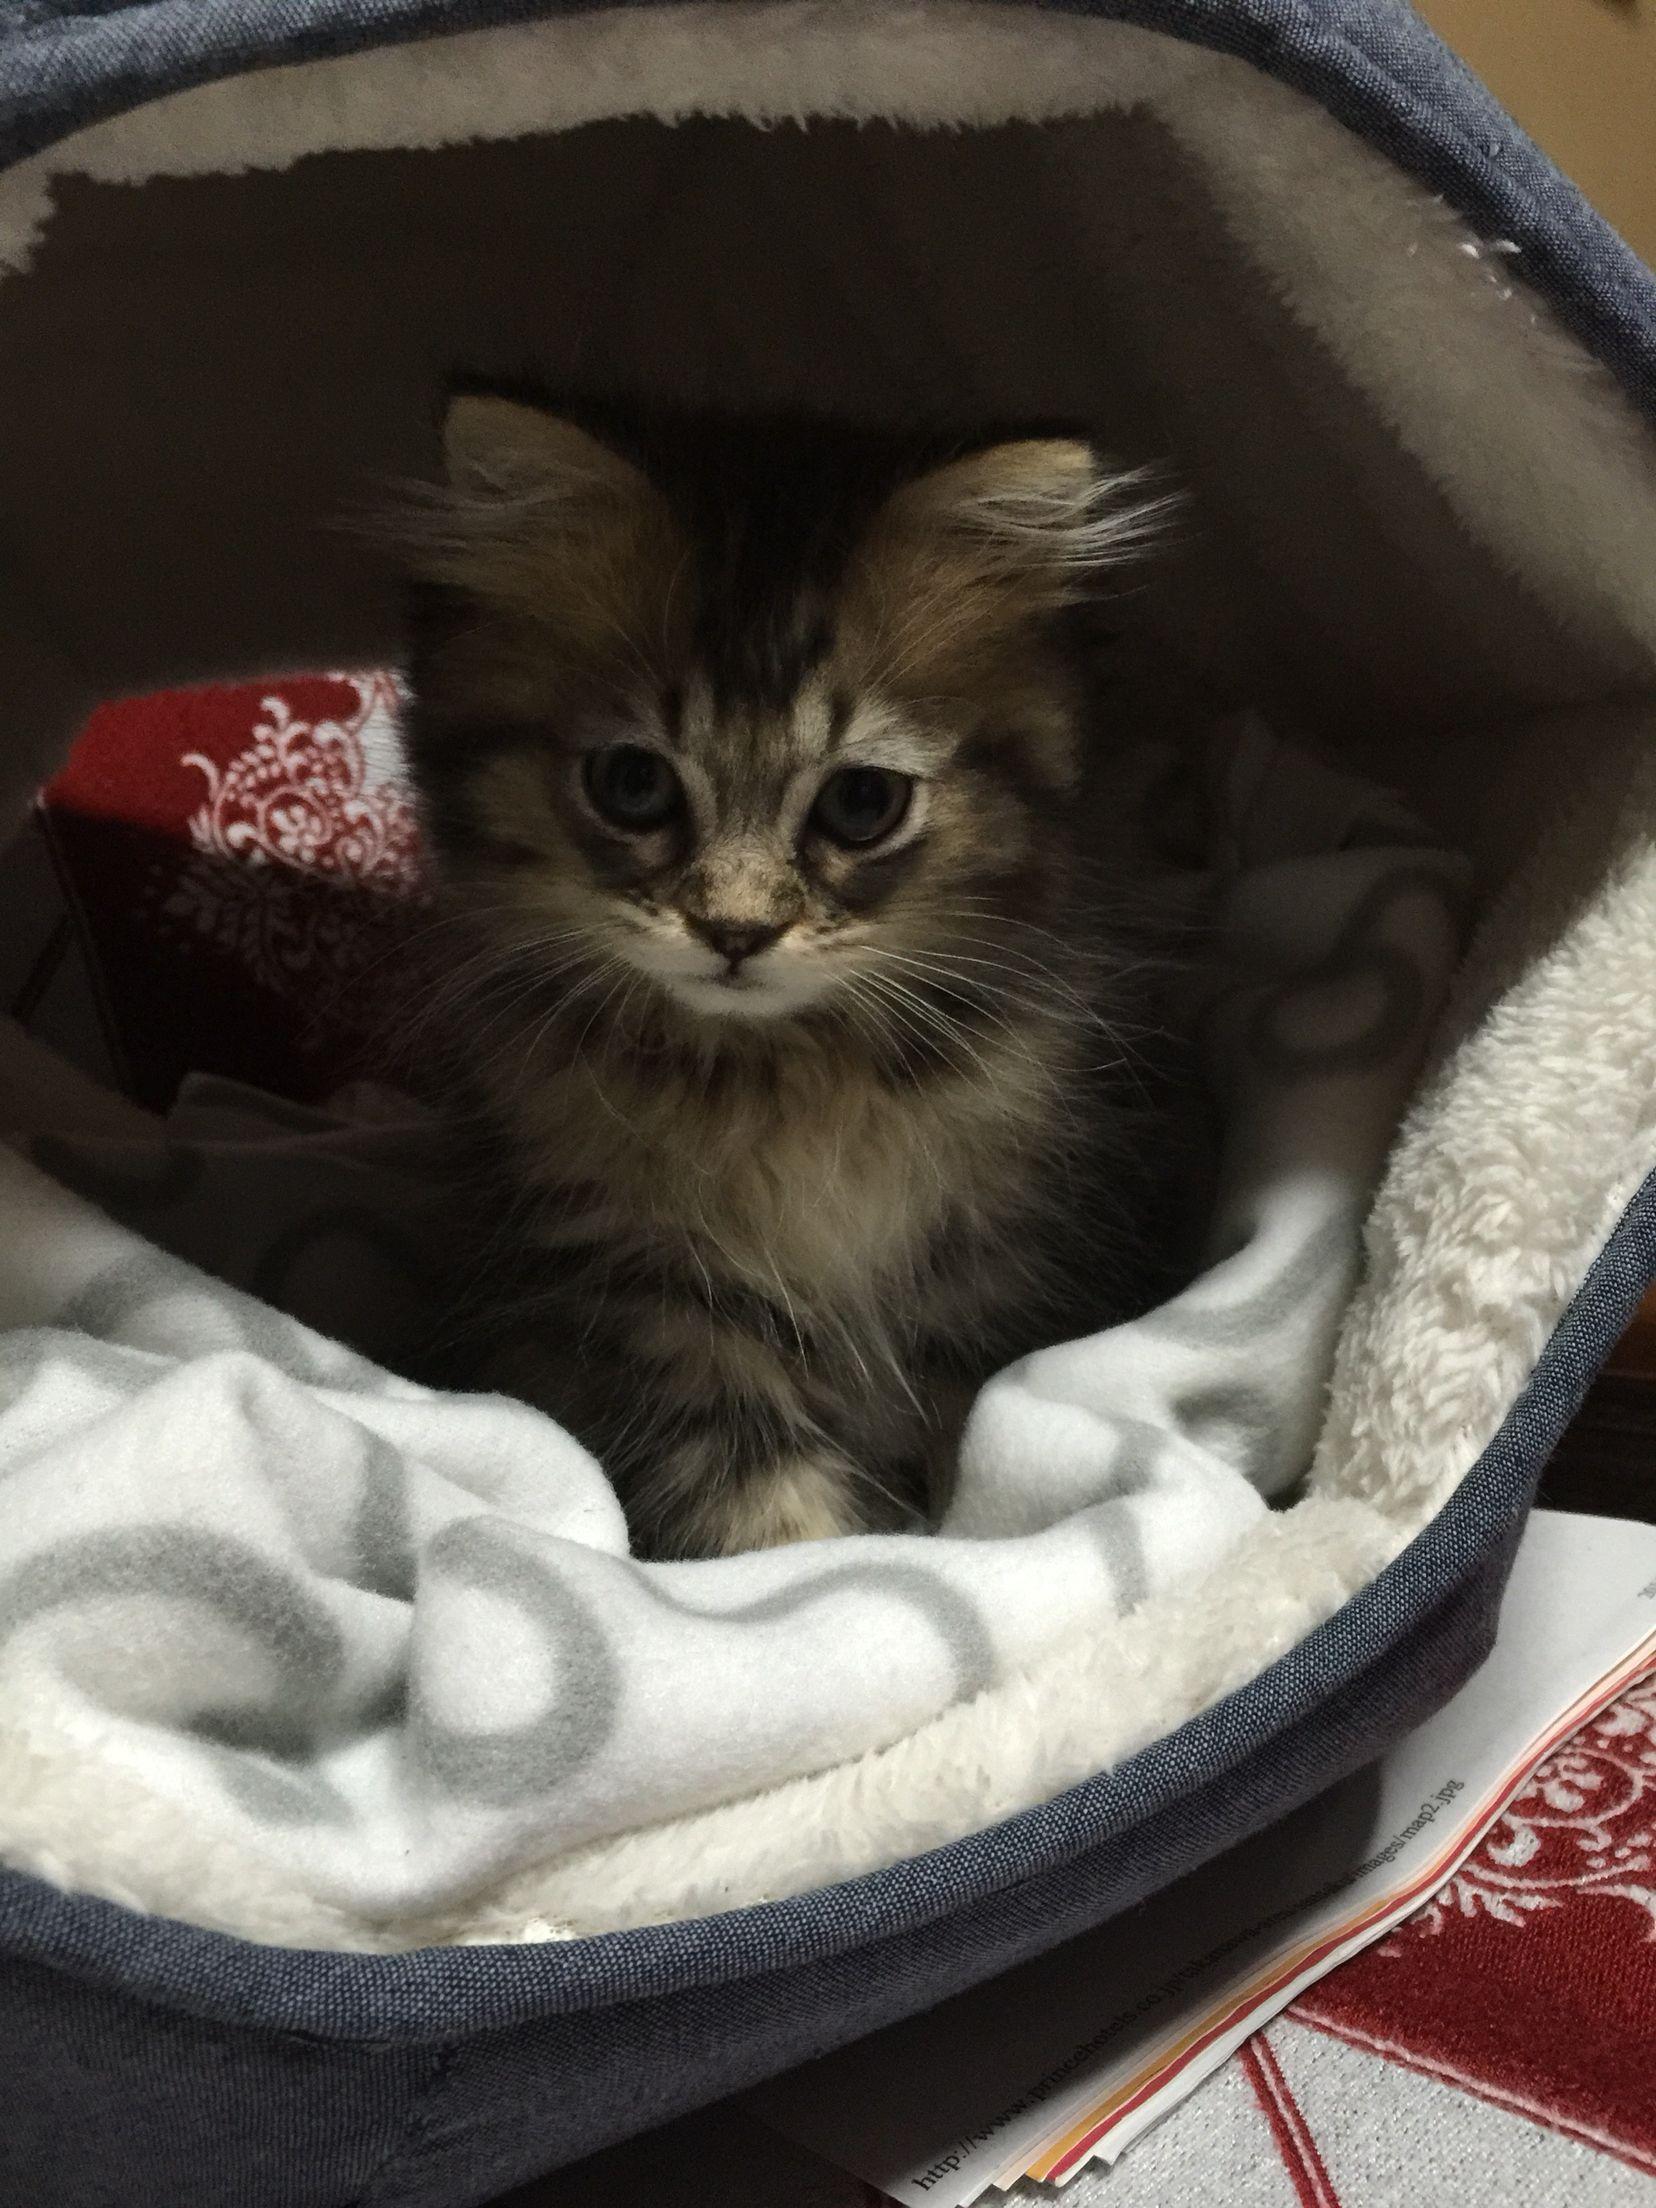 Name of the kitten is Kintoki.